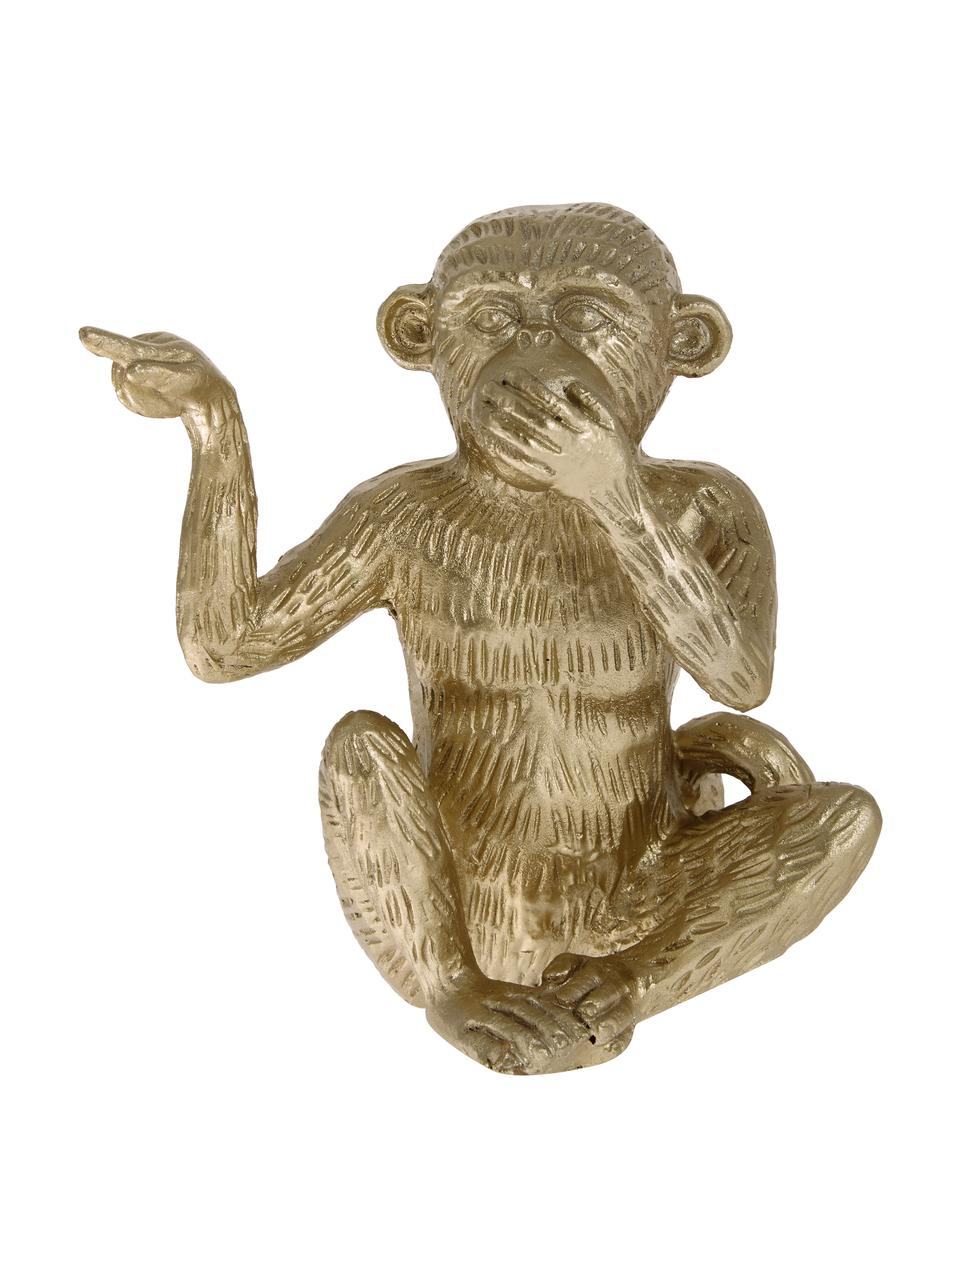 Deko-Objekt Monkey, Polyresin, Goldfarben, 14 x 15 cm